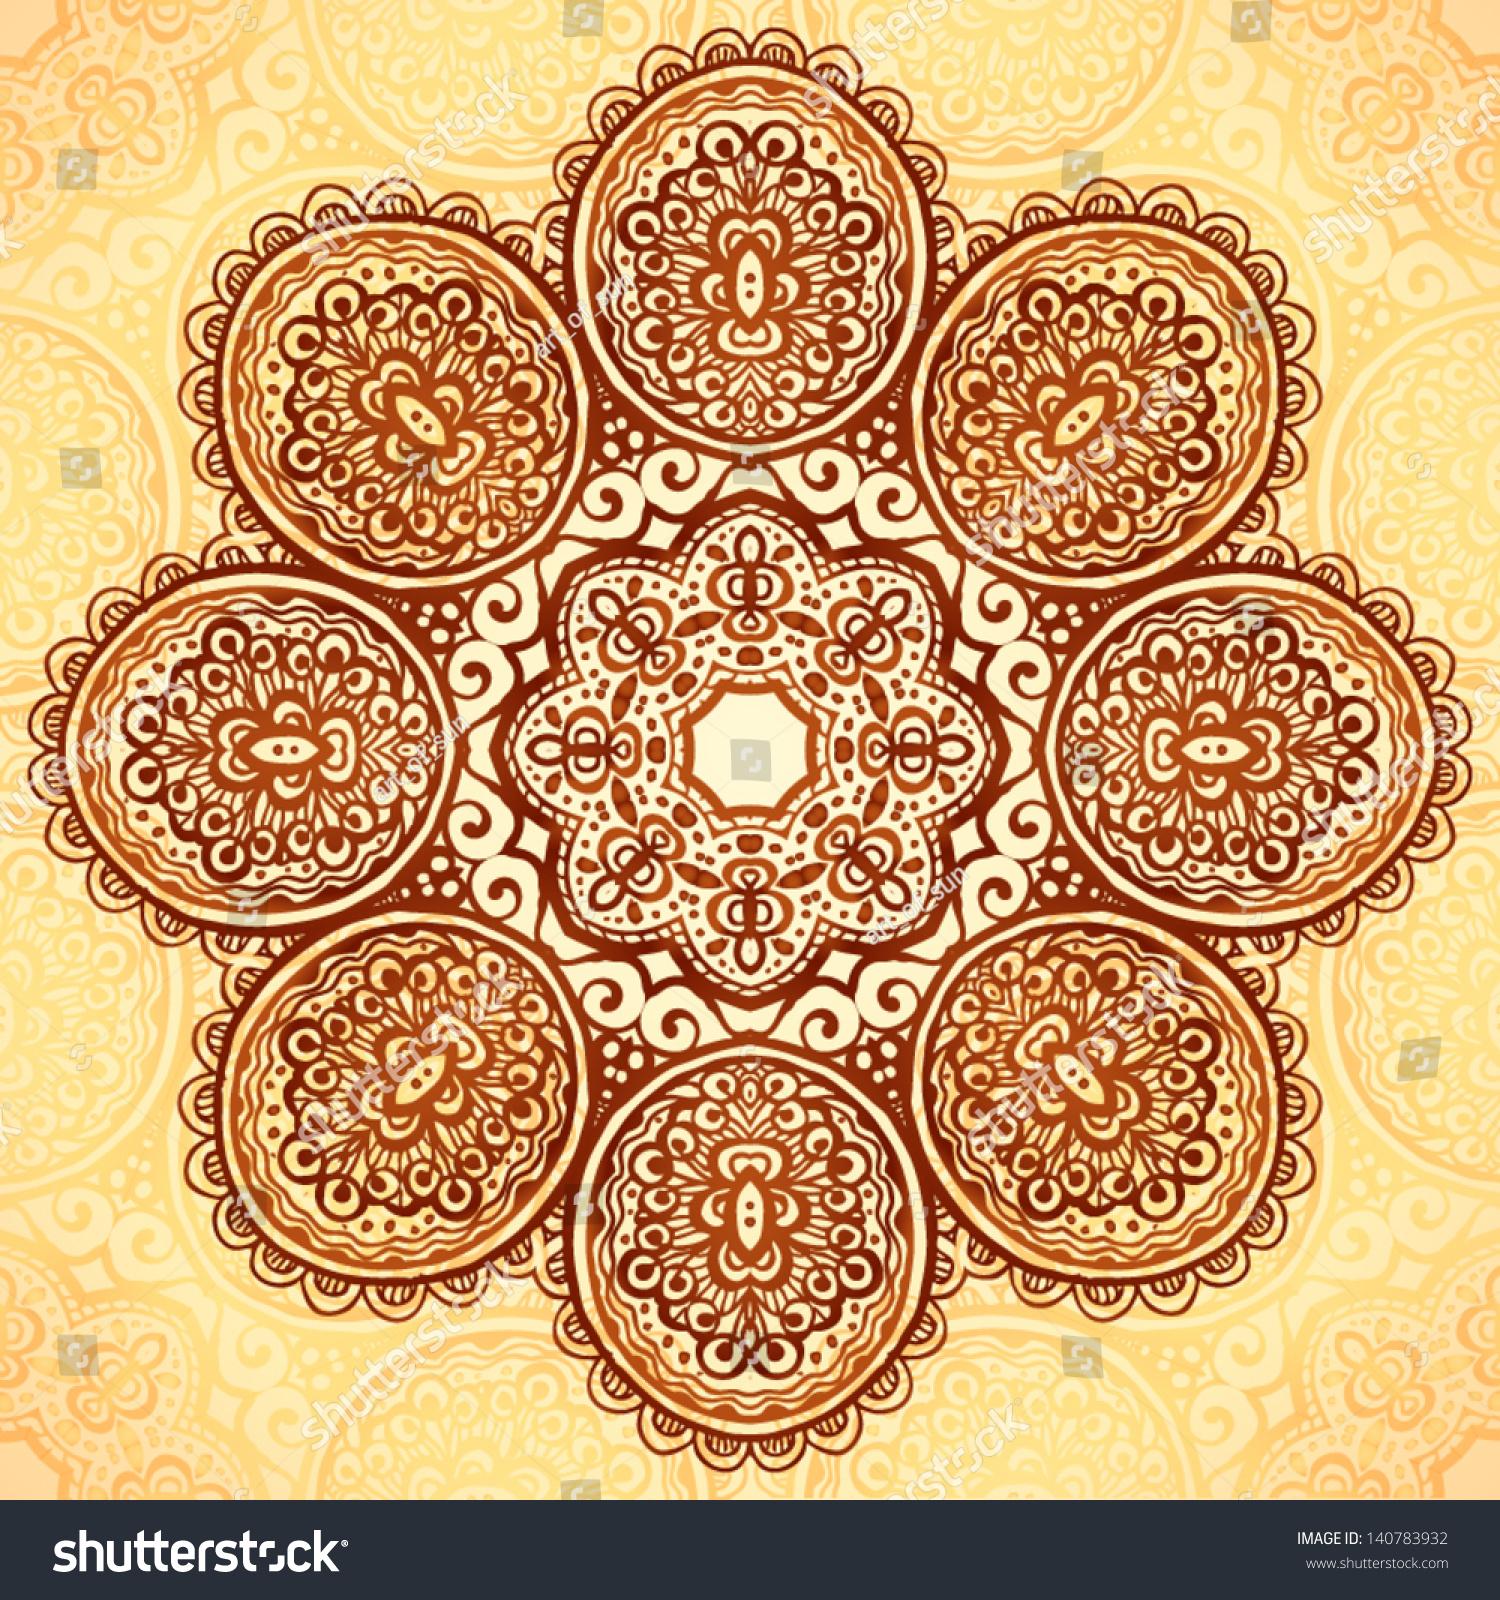 Ornate vintage vector background in mehndi style royalty free stock - Ornate Vintage Vector Flower Napkin Background In Mehndi Indian Style